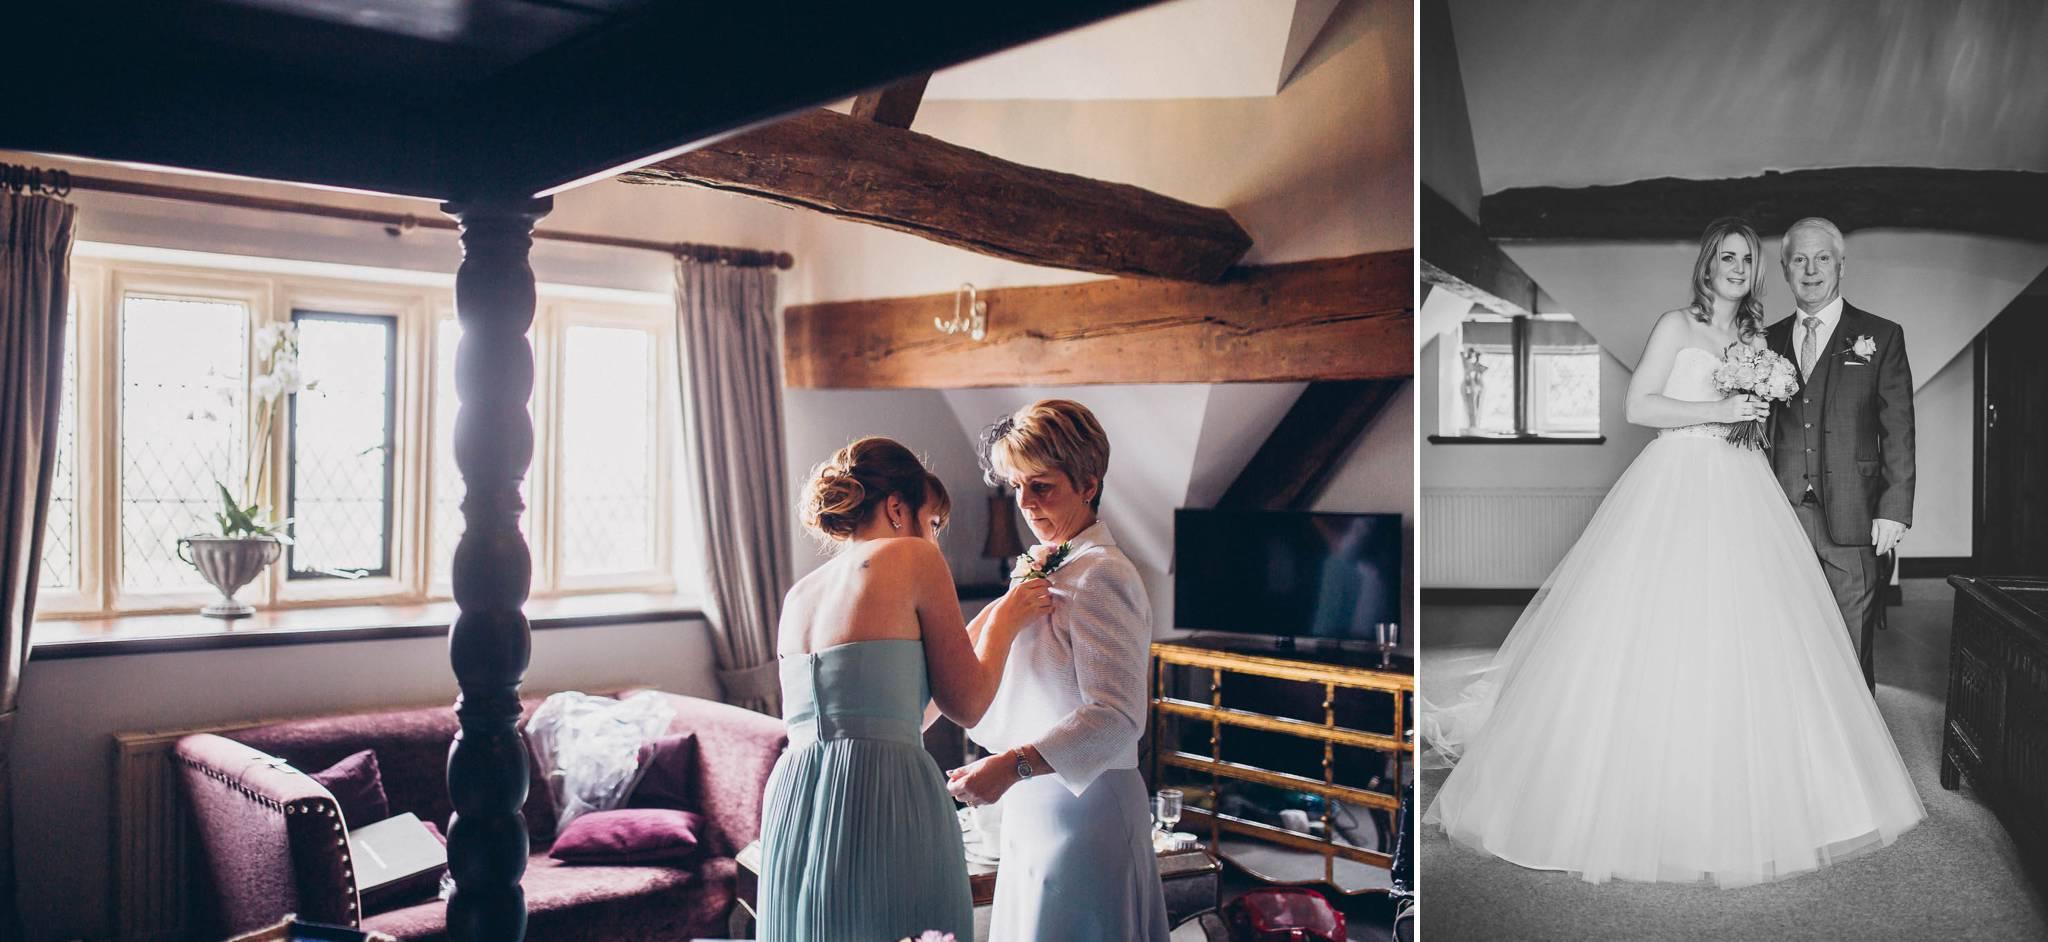 weston-hall-wedding-photographer 5.jpg